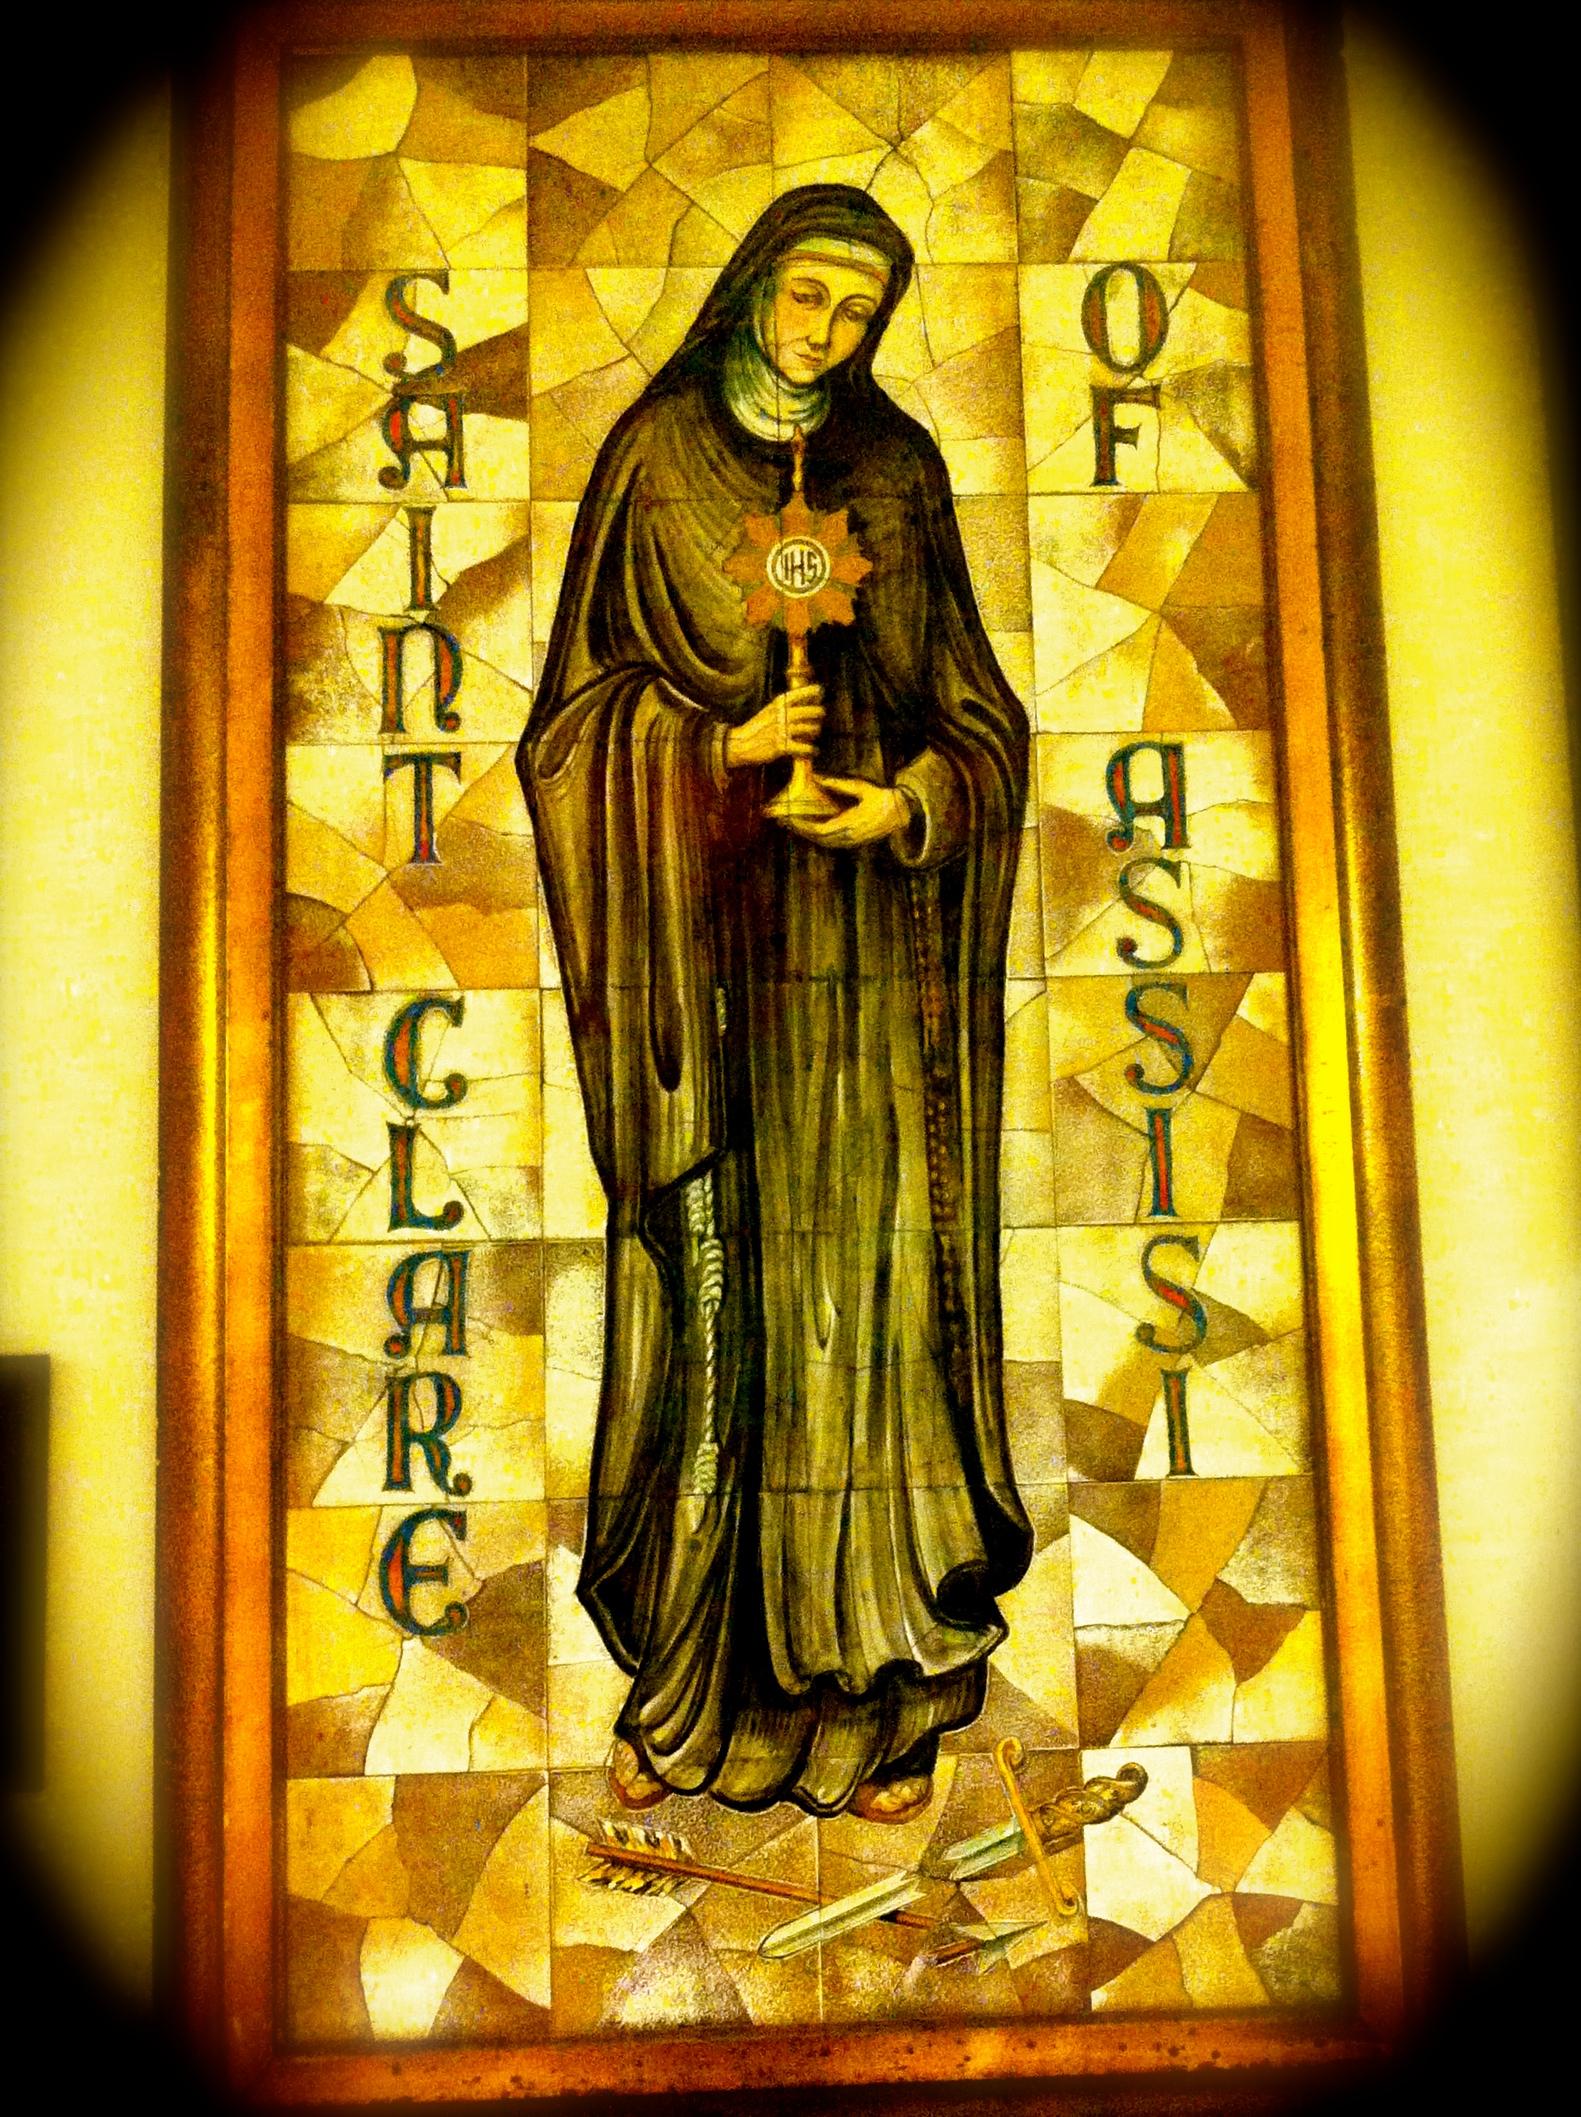 photo by Peter Damour, Sacristan, St. Clare Parish